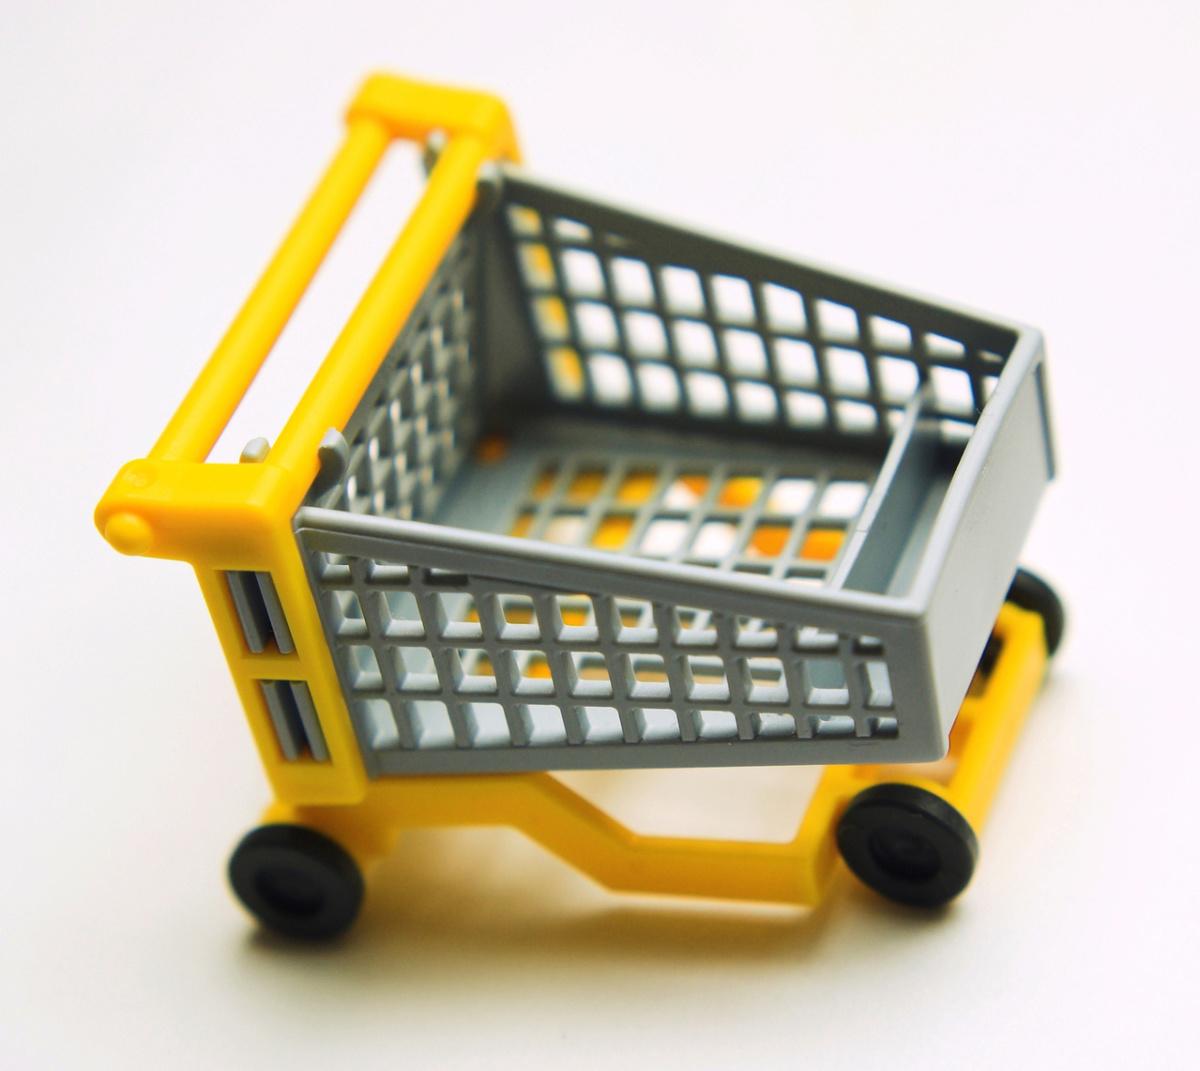 Toy Cart 1421648 1279×1140